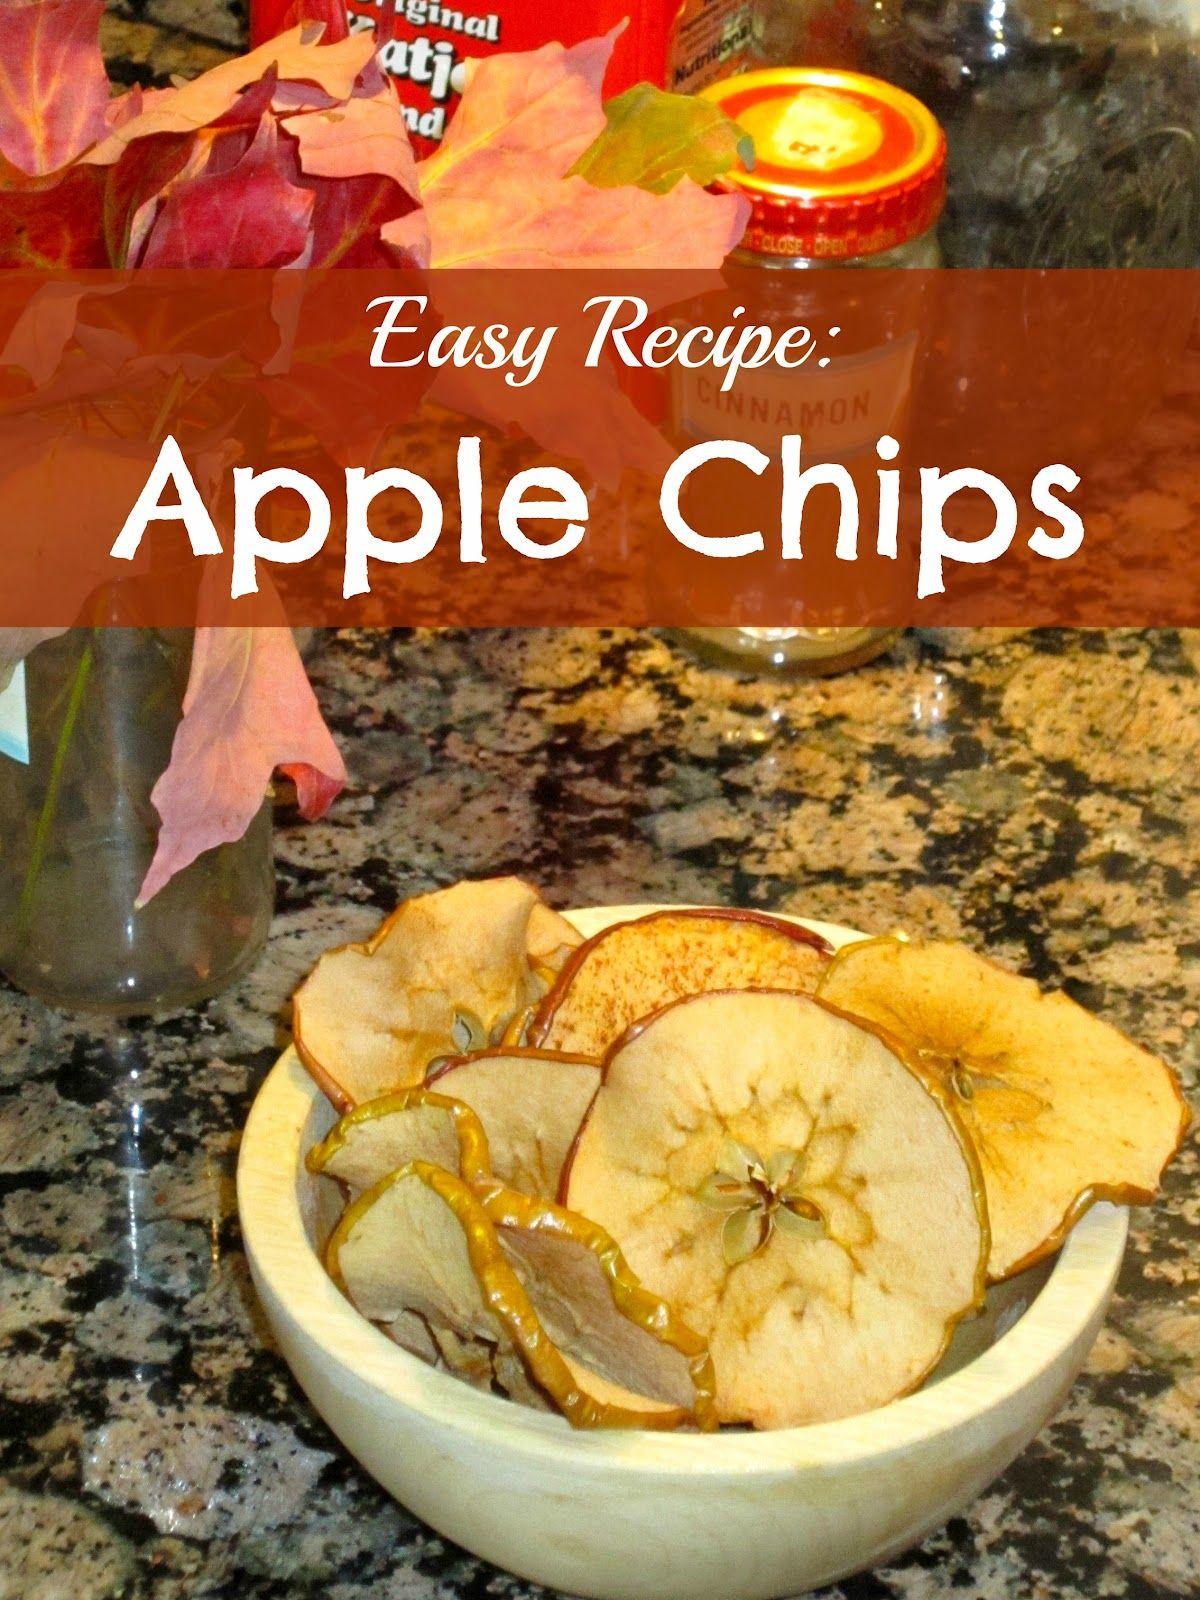 Baked Cinnamon Apple Chips | Sally's Baking Addiction